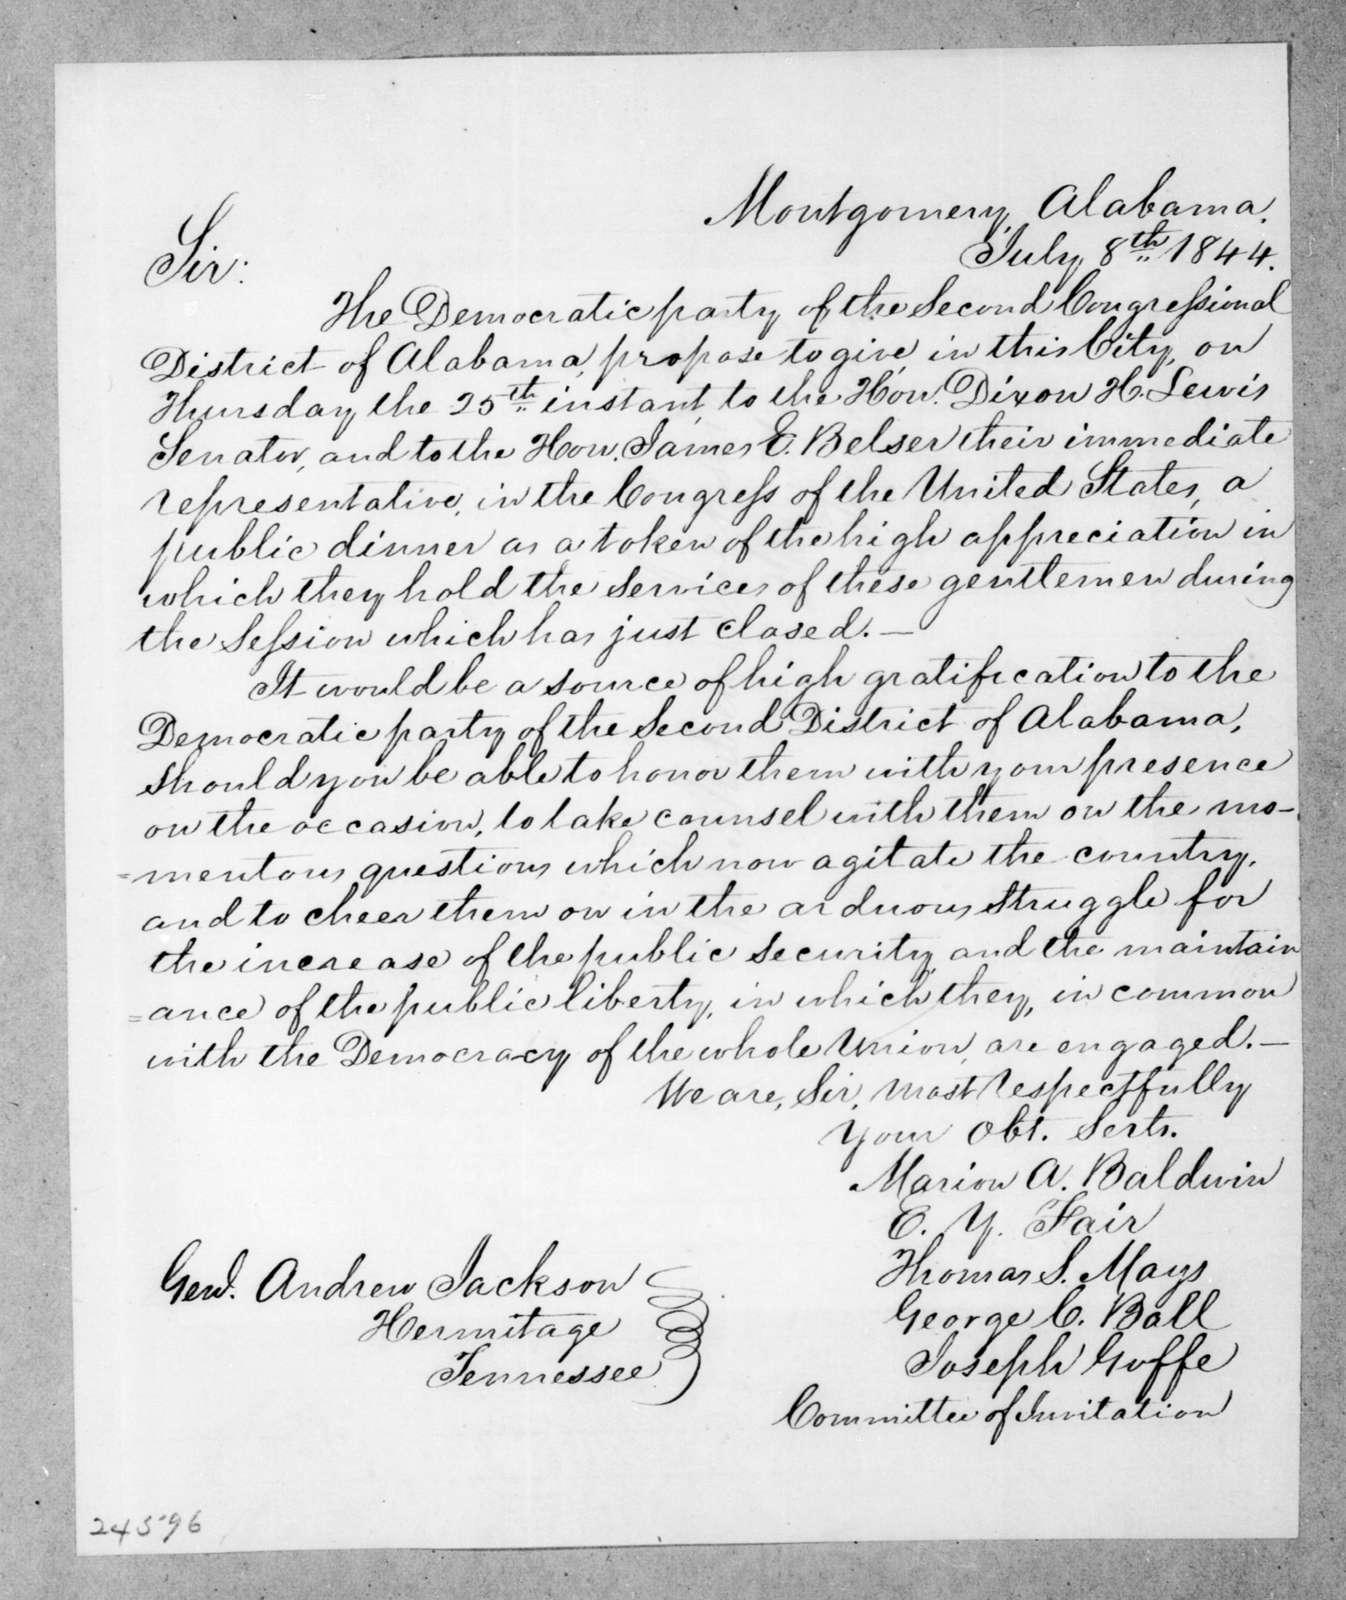 Marion Augustus Baldwin et al. to Andrew Jackson, July 8, 1844